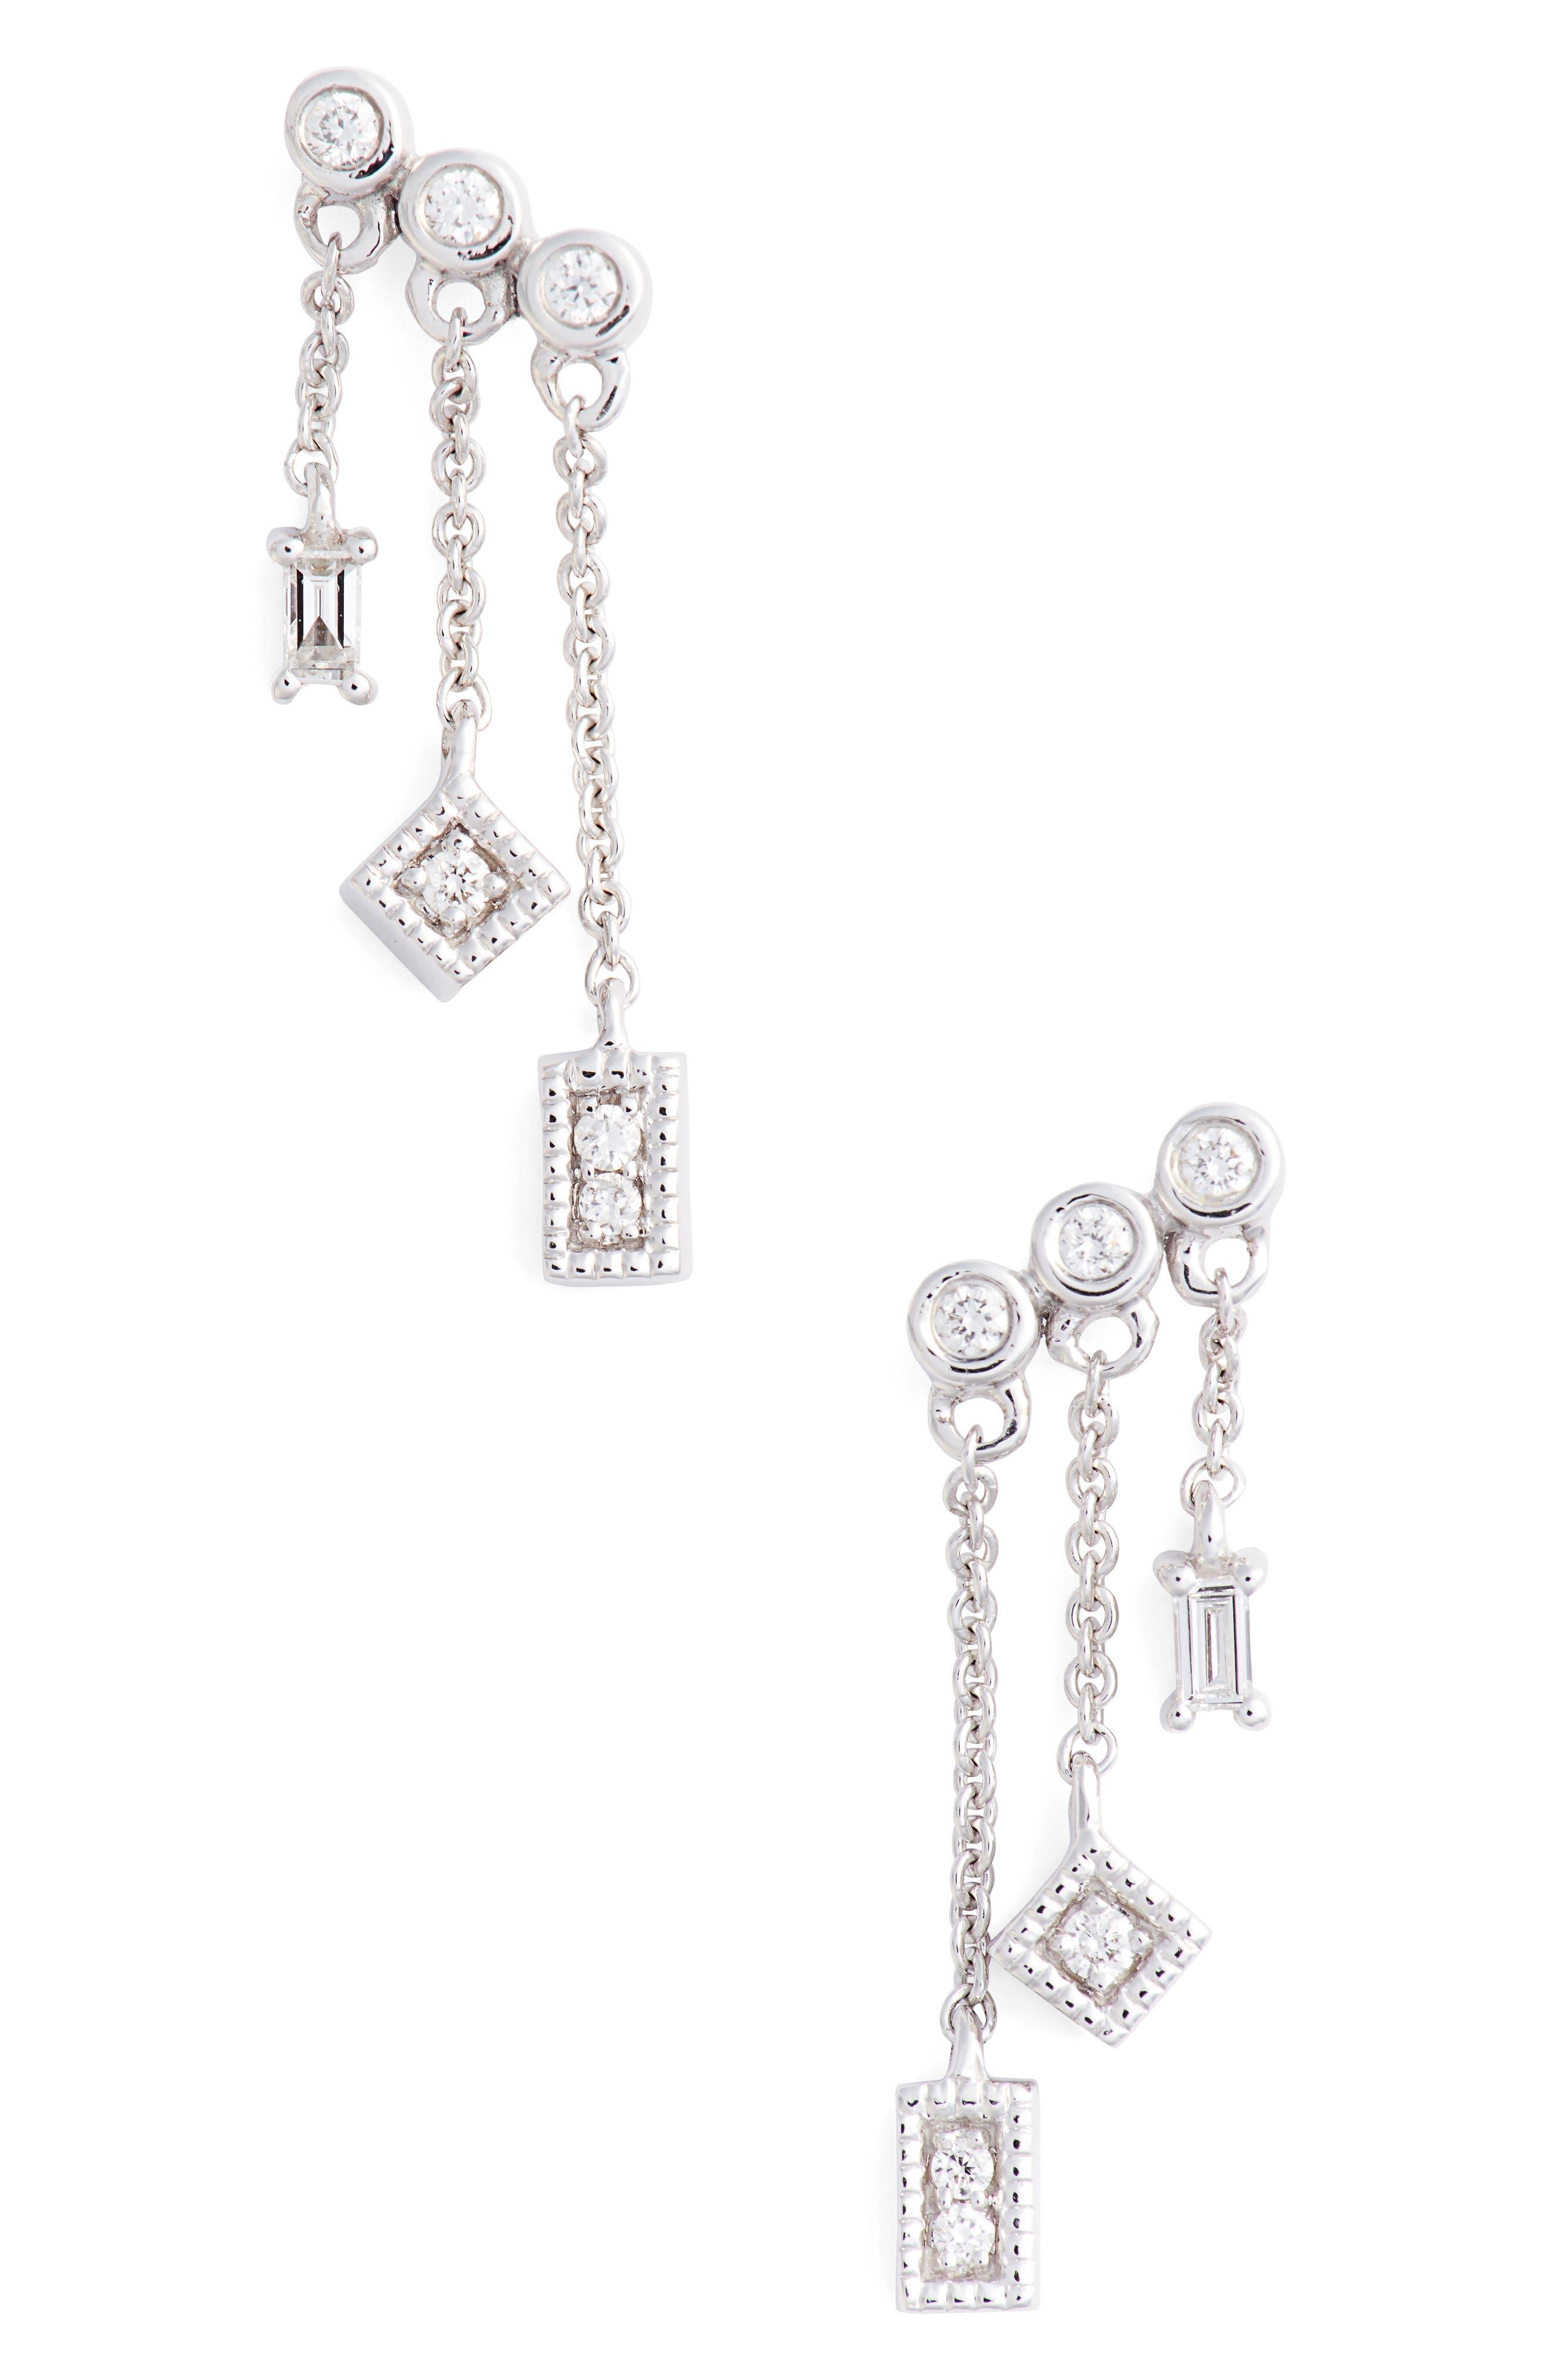 Alternate Image 1 Selected - Dana Rebecca Designs Lisa Michelle Diamond Drop Earrings